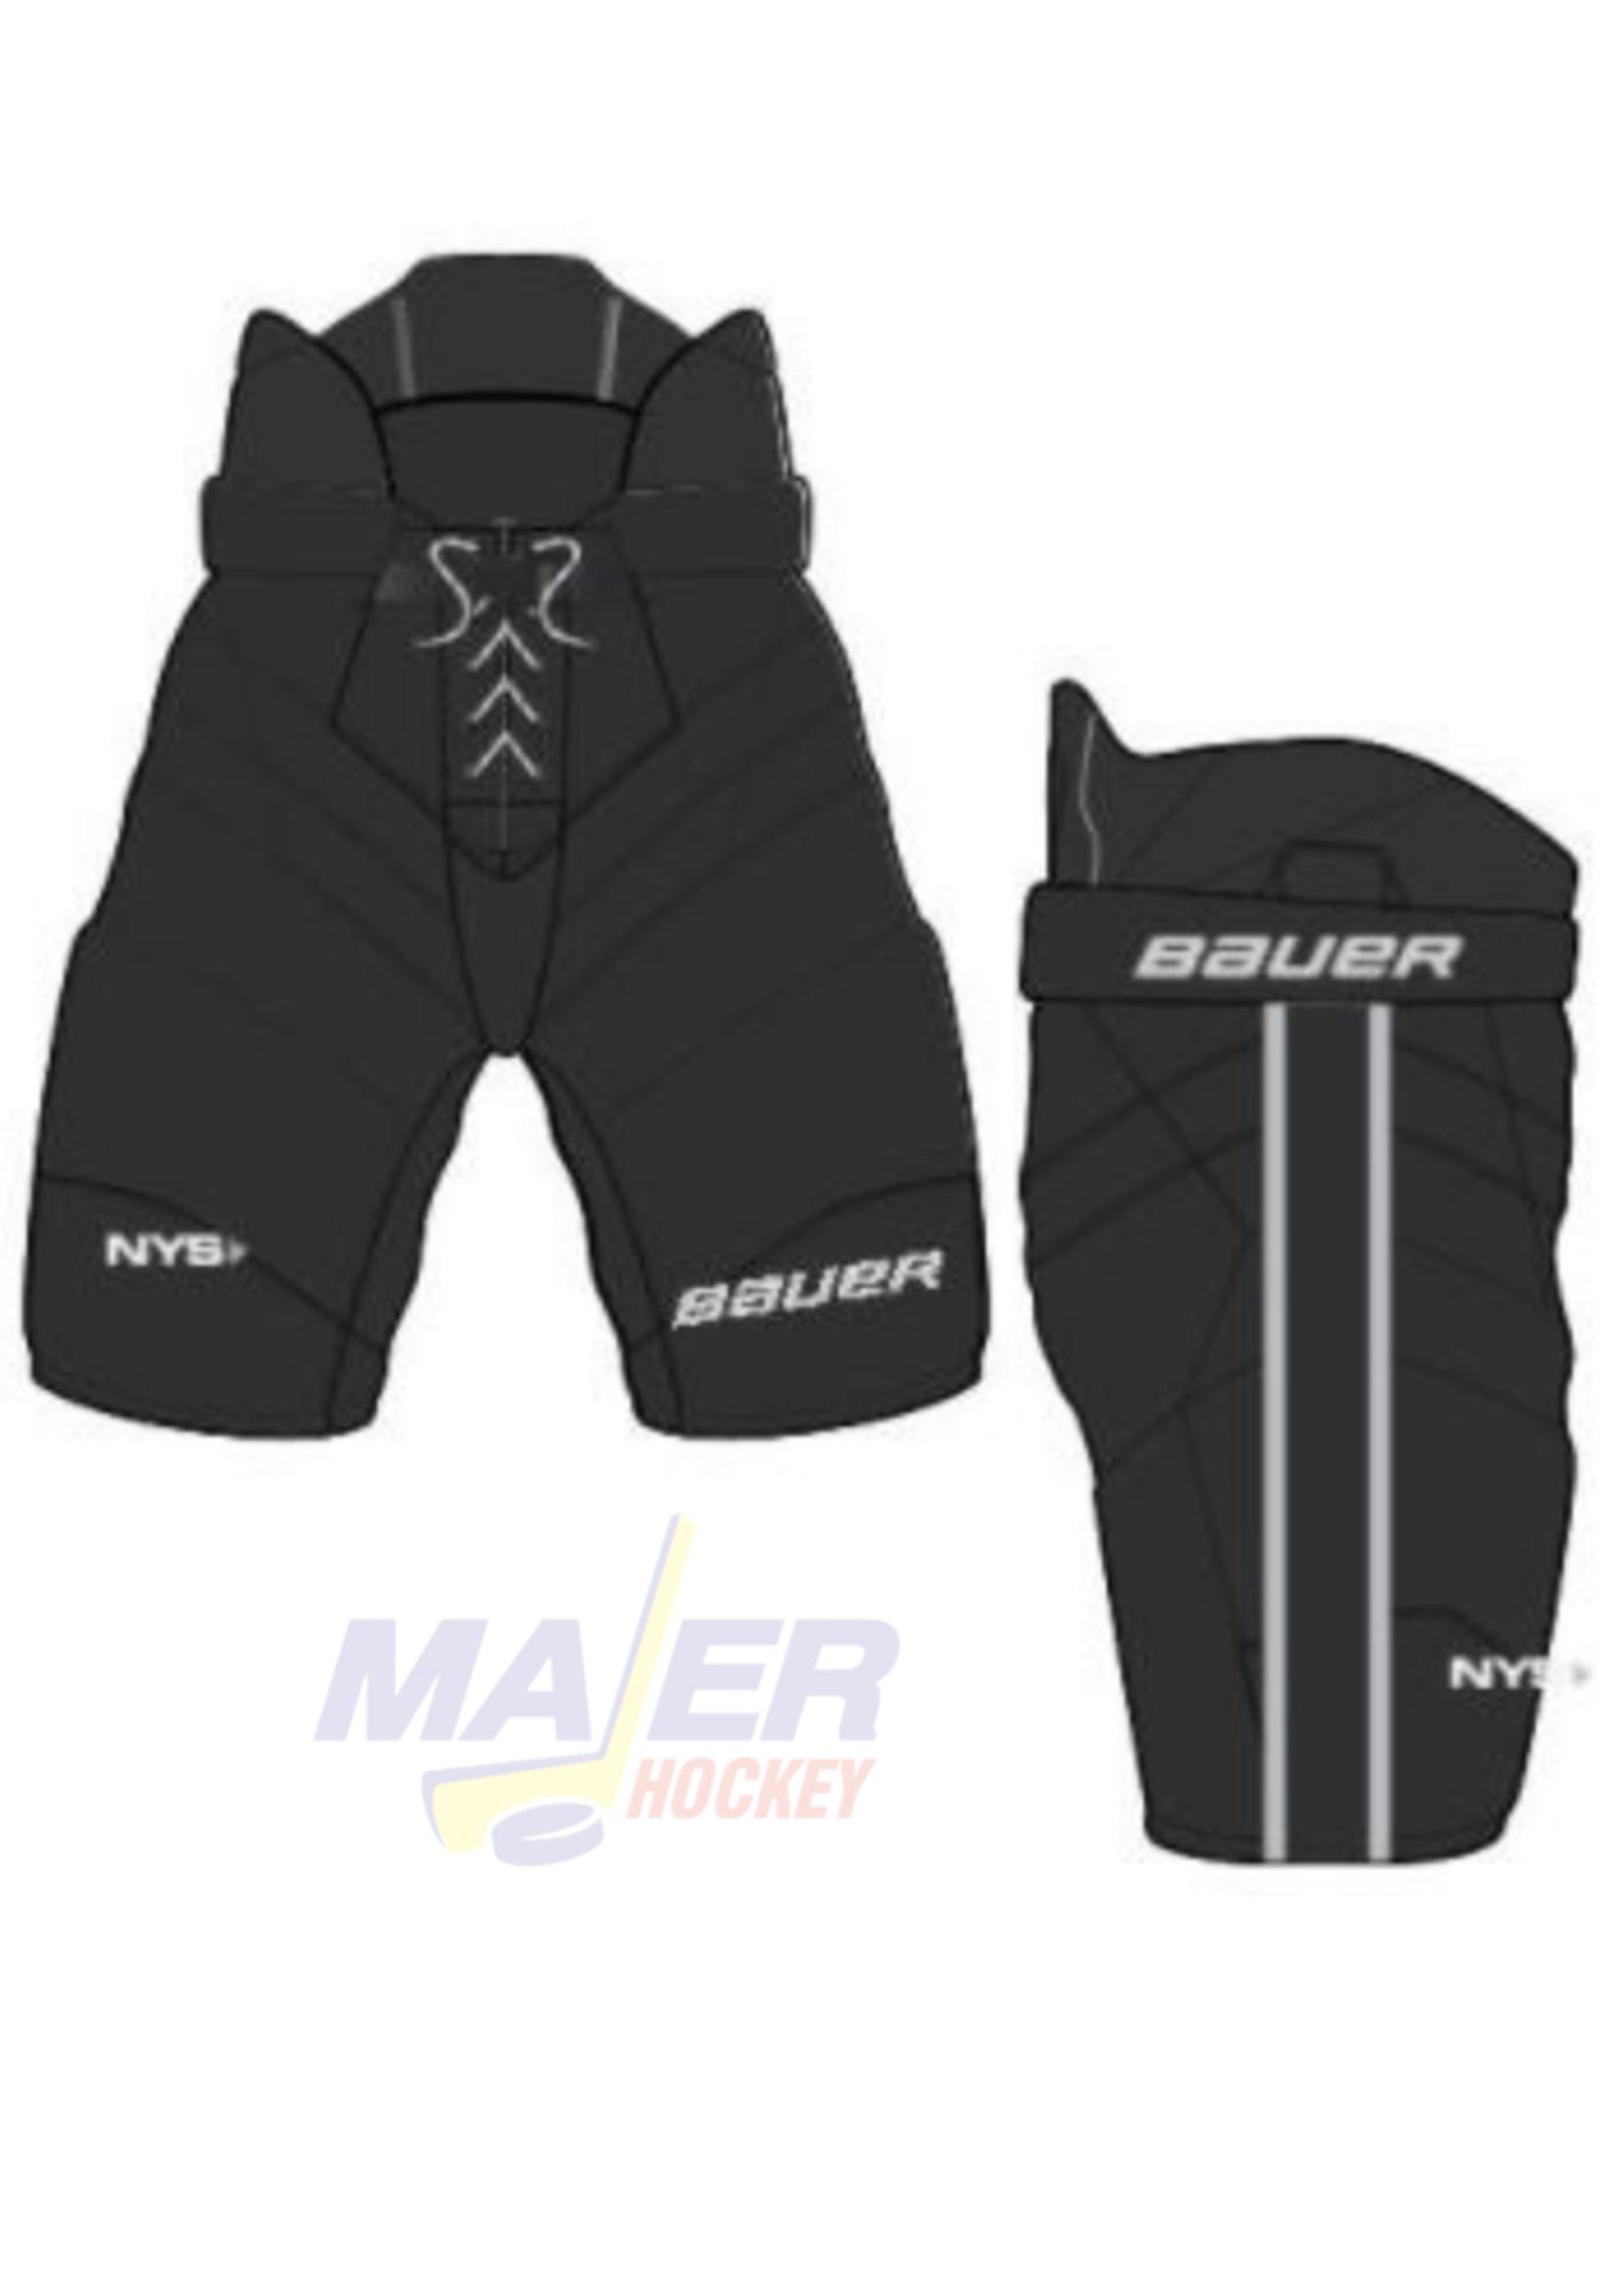 Bauer NYS Yth Hockey Pants